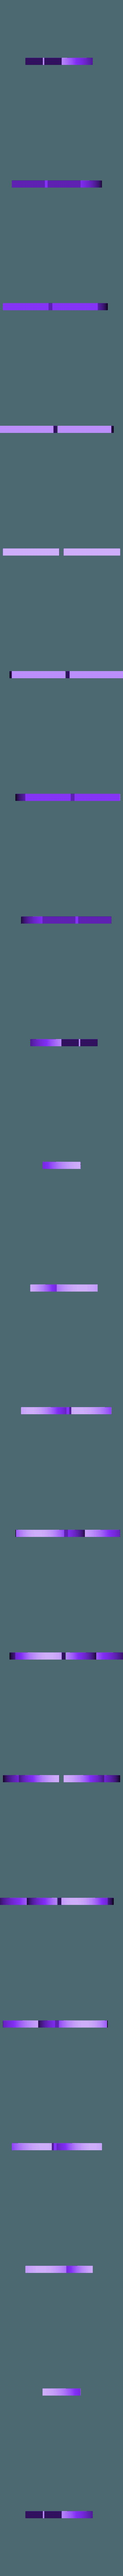 Uta_jazz_green.STL Download free STL file Minimal Multi-color NBA coasters • 3D print object, MosaicManufacturing